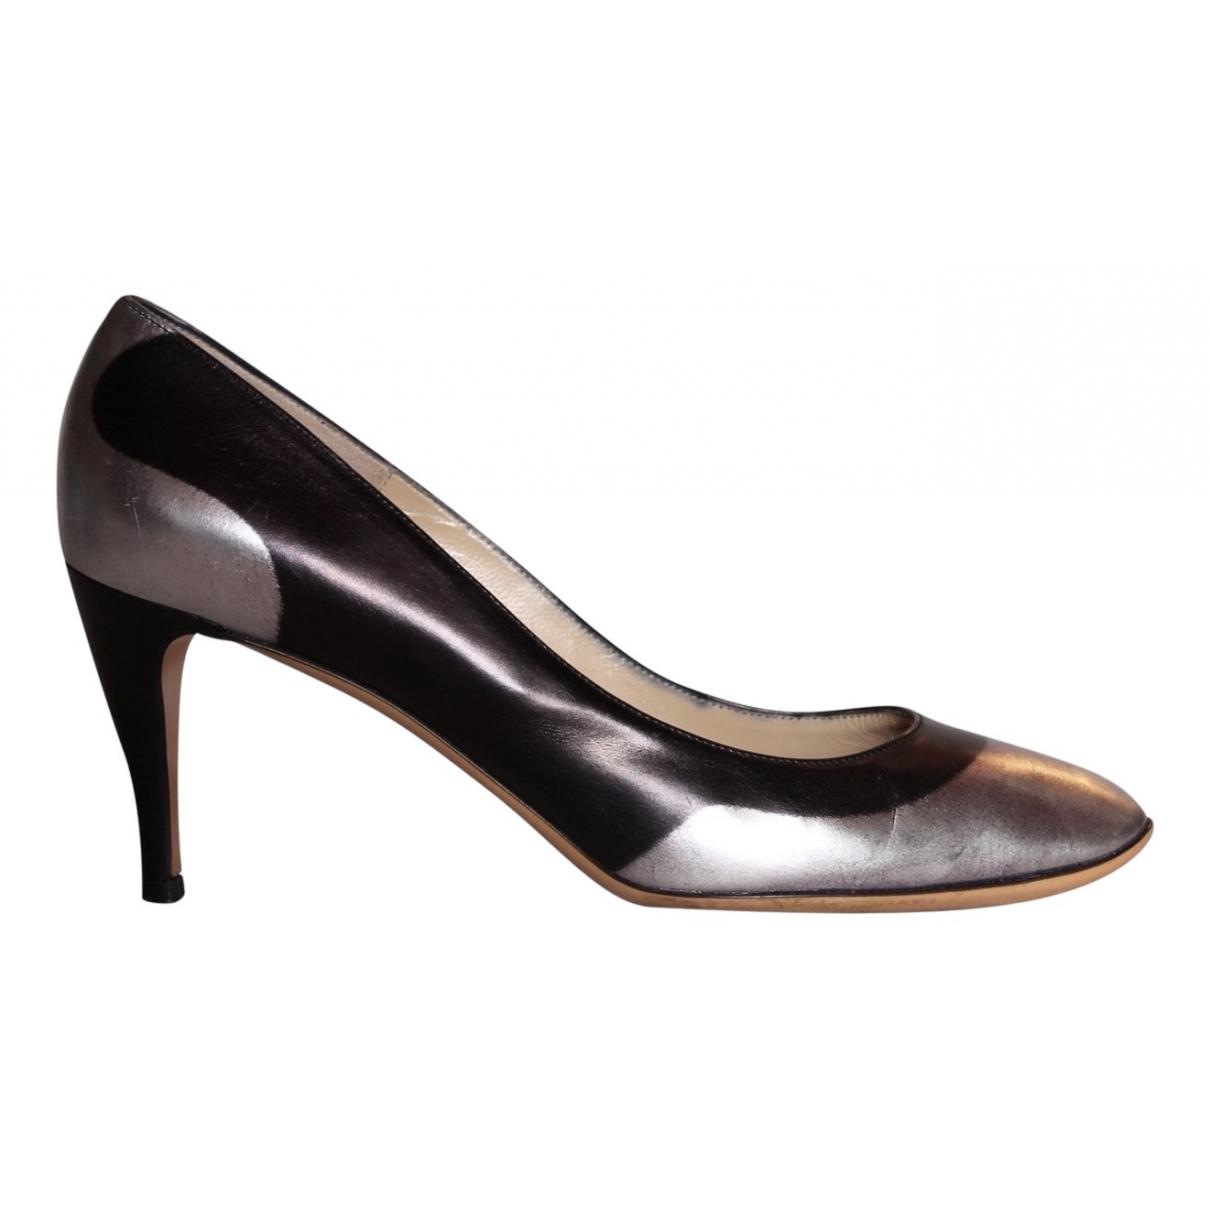 Emporio Armani \N Black Leather Heels for Women 38 EU